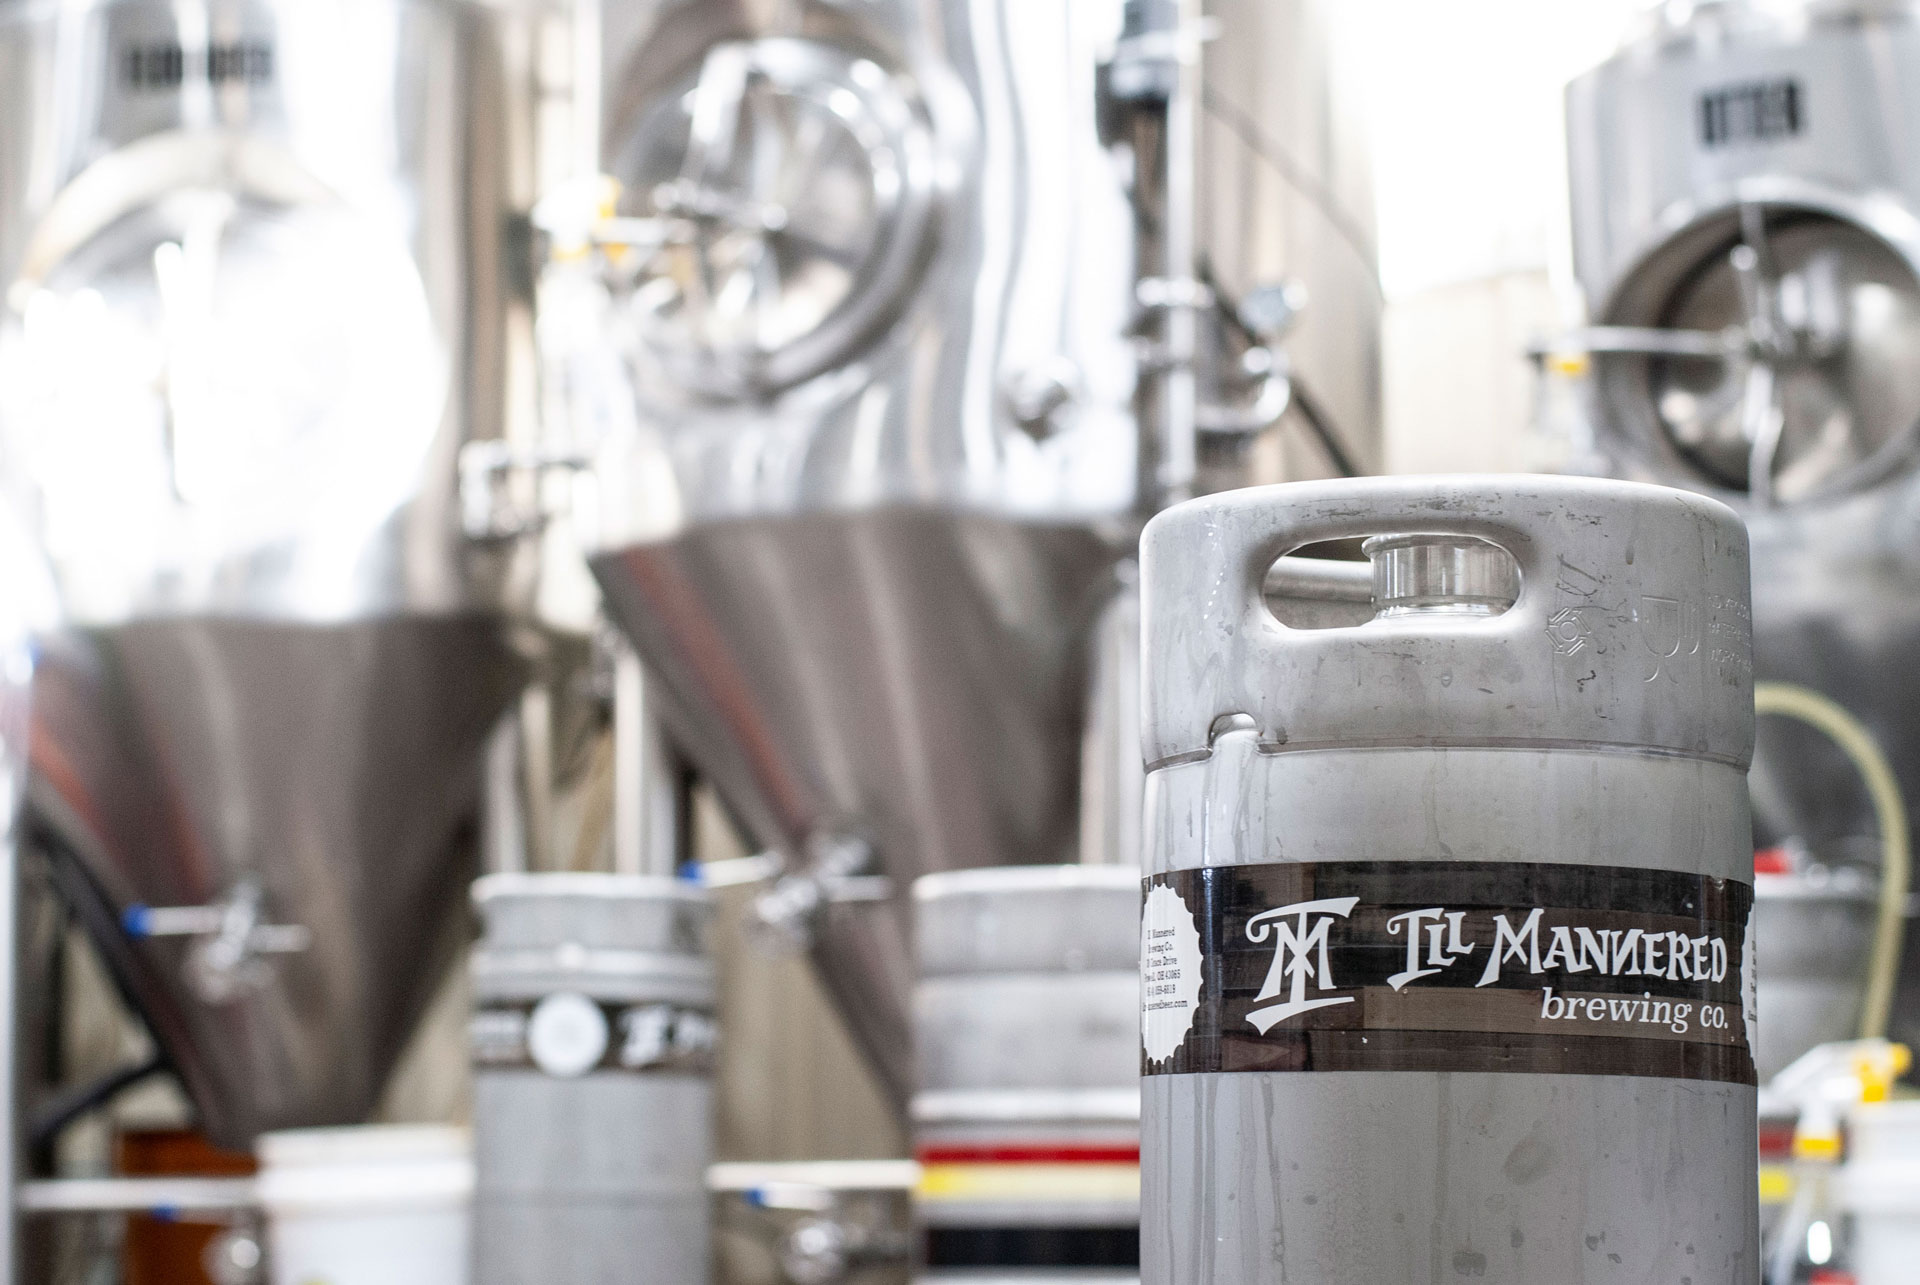 !-Ill-Mannered-Beer-Taproom-10.jpg